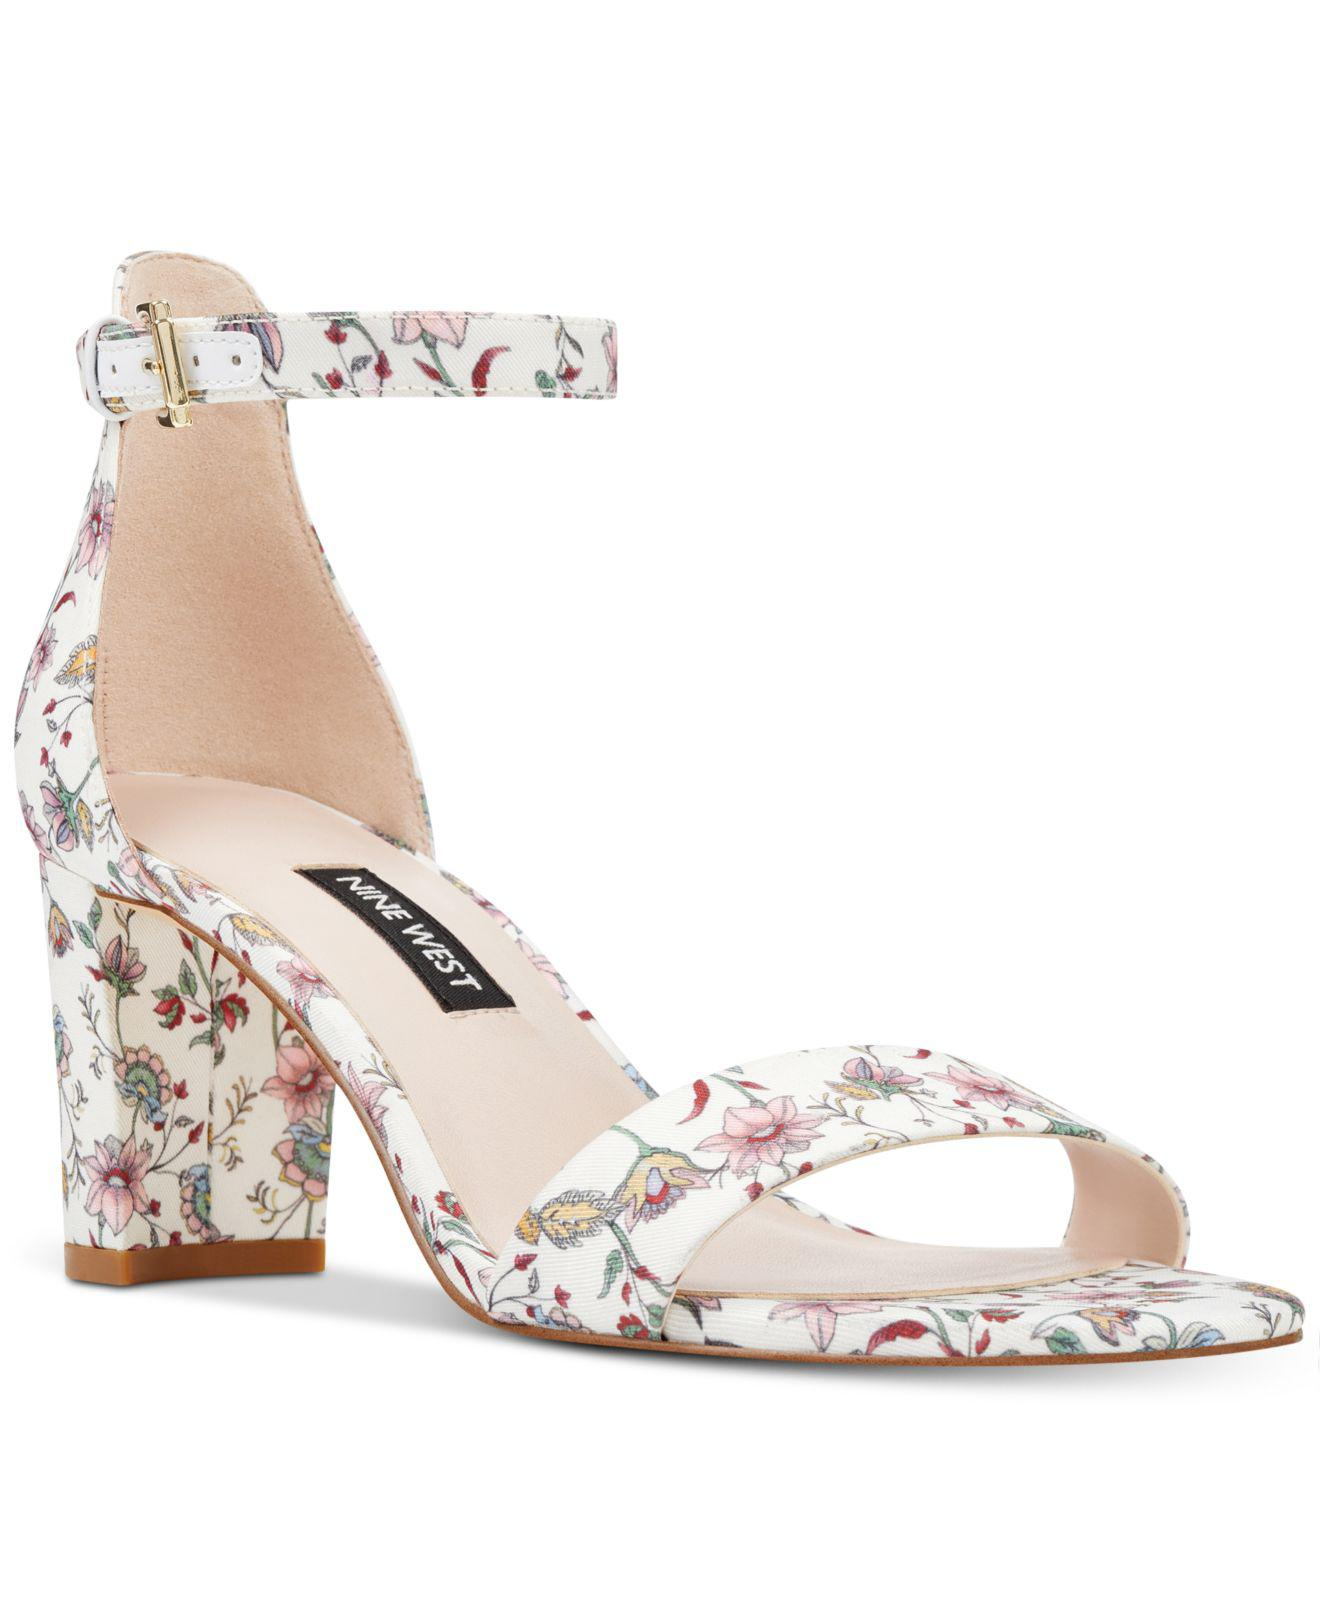 43600398e Lyst - Nine West Pruce Block-heel Sandals